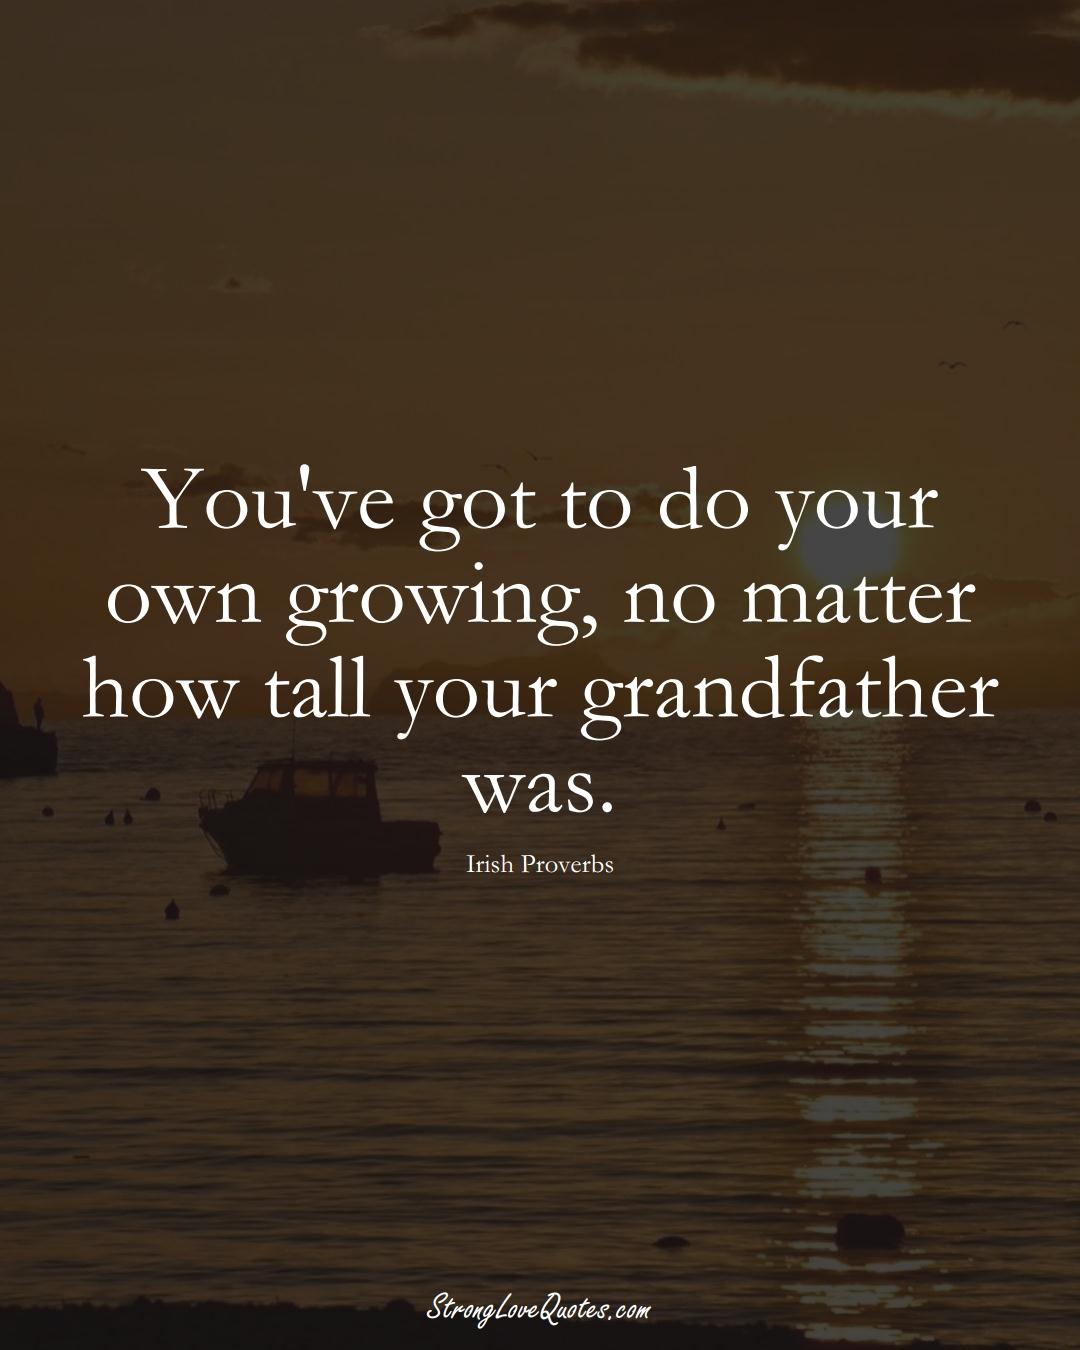 You've got to do your own growing, no matter how tall your grandfather was. (Irish Sayings);  #EuropeanSayings